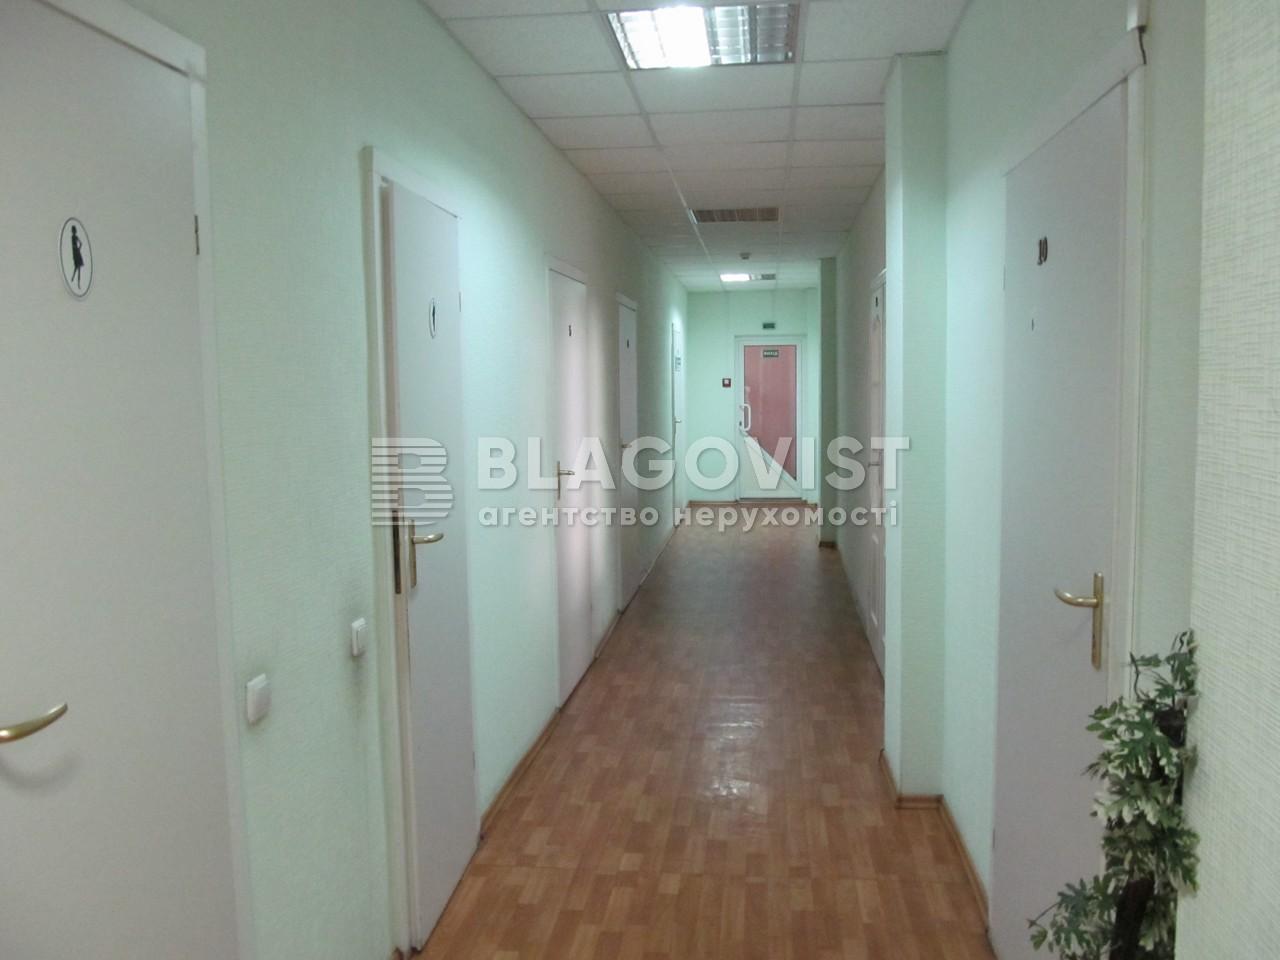 Офисно-складское помещение, F-33728, Скляренко Семена, Киев - Фото 14